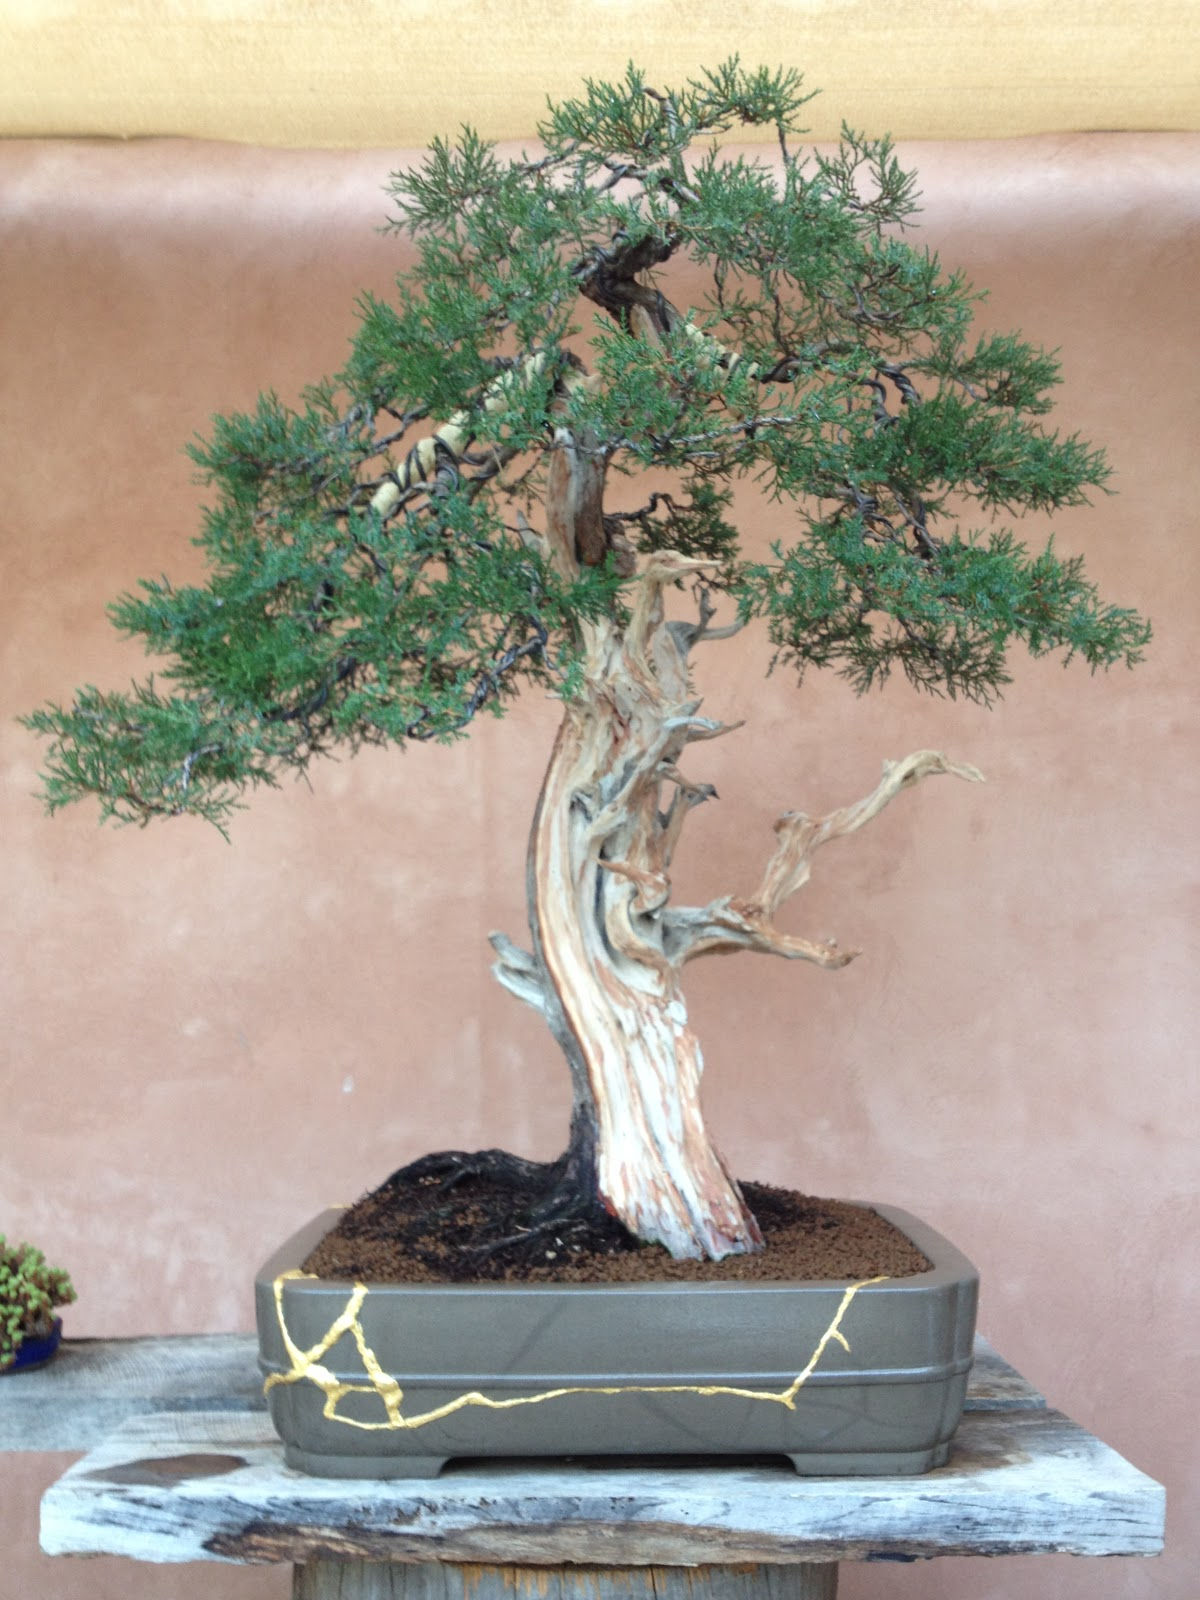 Fkb escuela bonsai mallorca recadero bons i contempor neo for Simultaneo contemporaneo